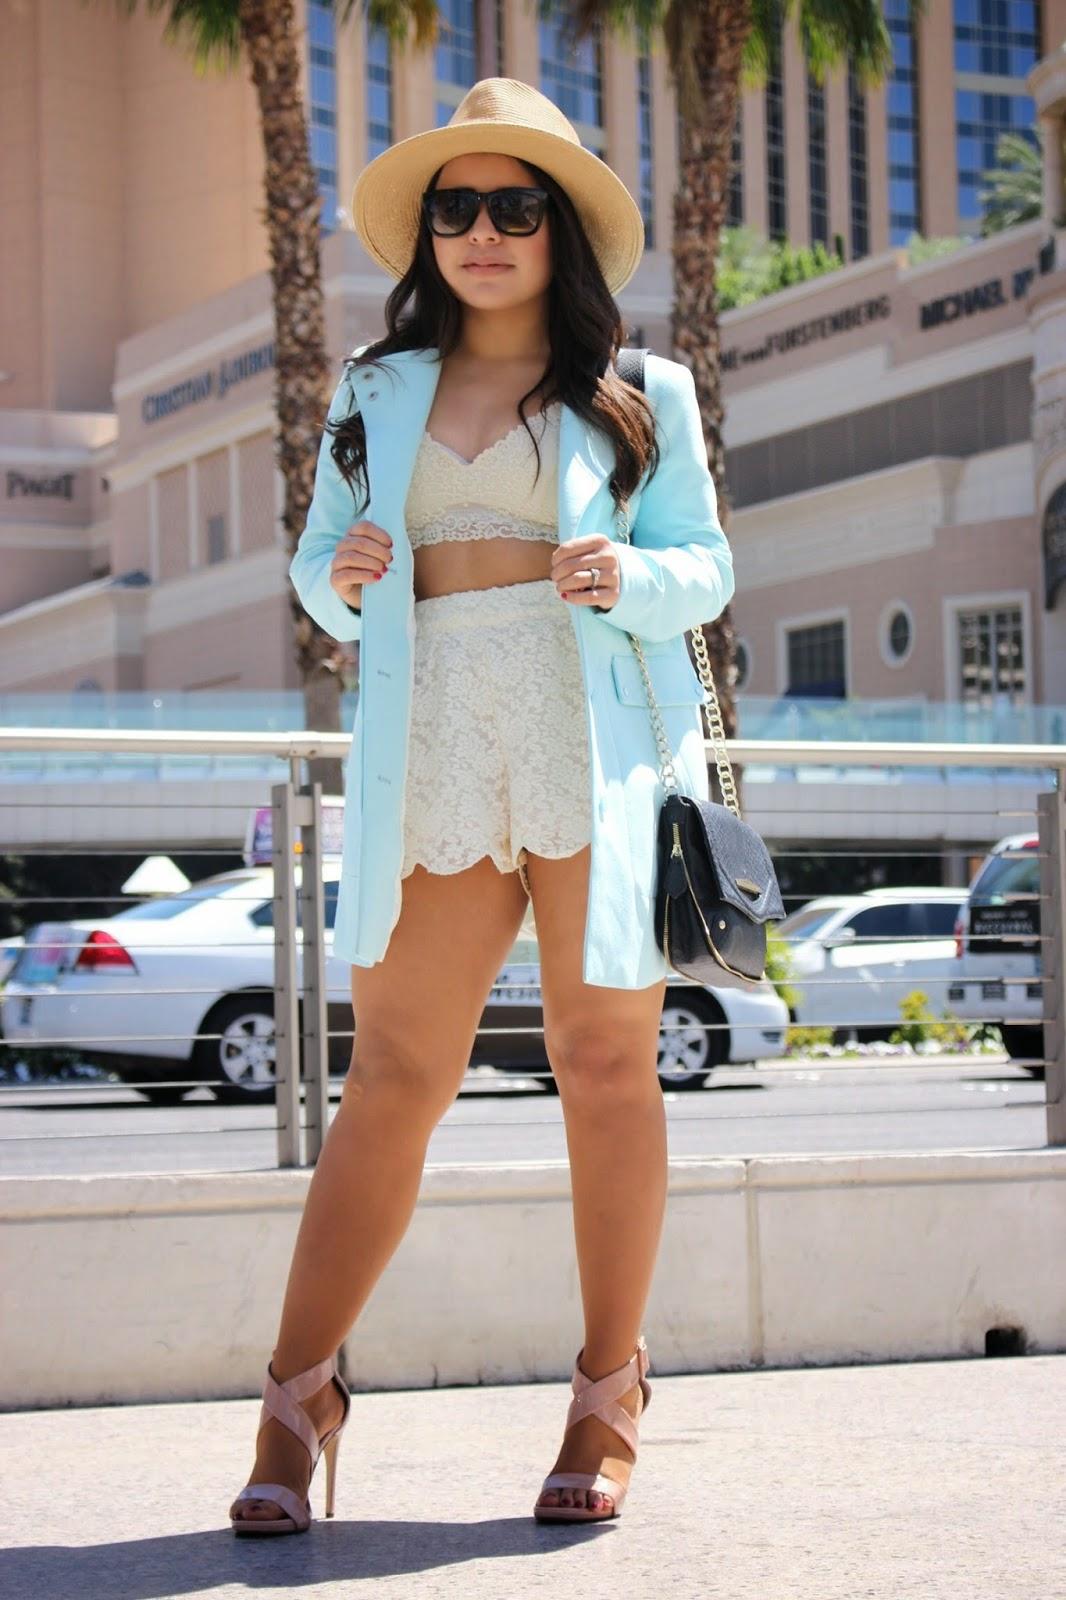 celebrity fashion for less, coachella celebrity style, kylie jenner style, kylie jenner coachella outfit